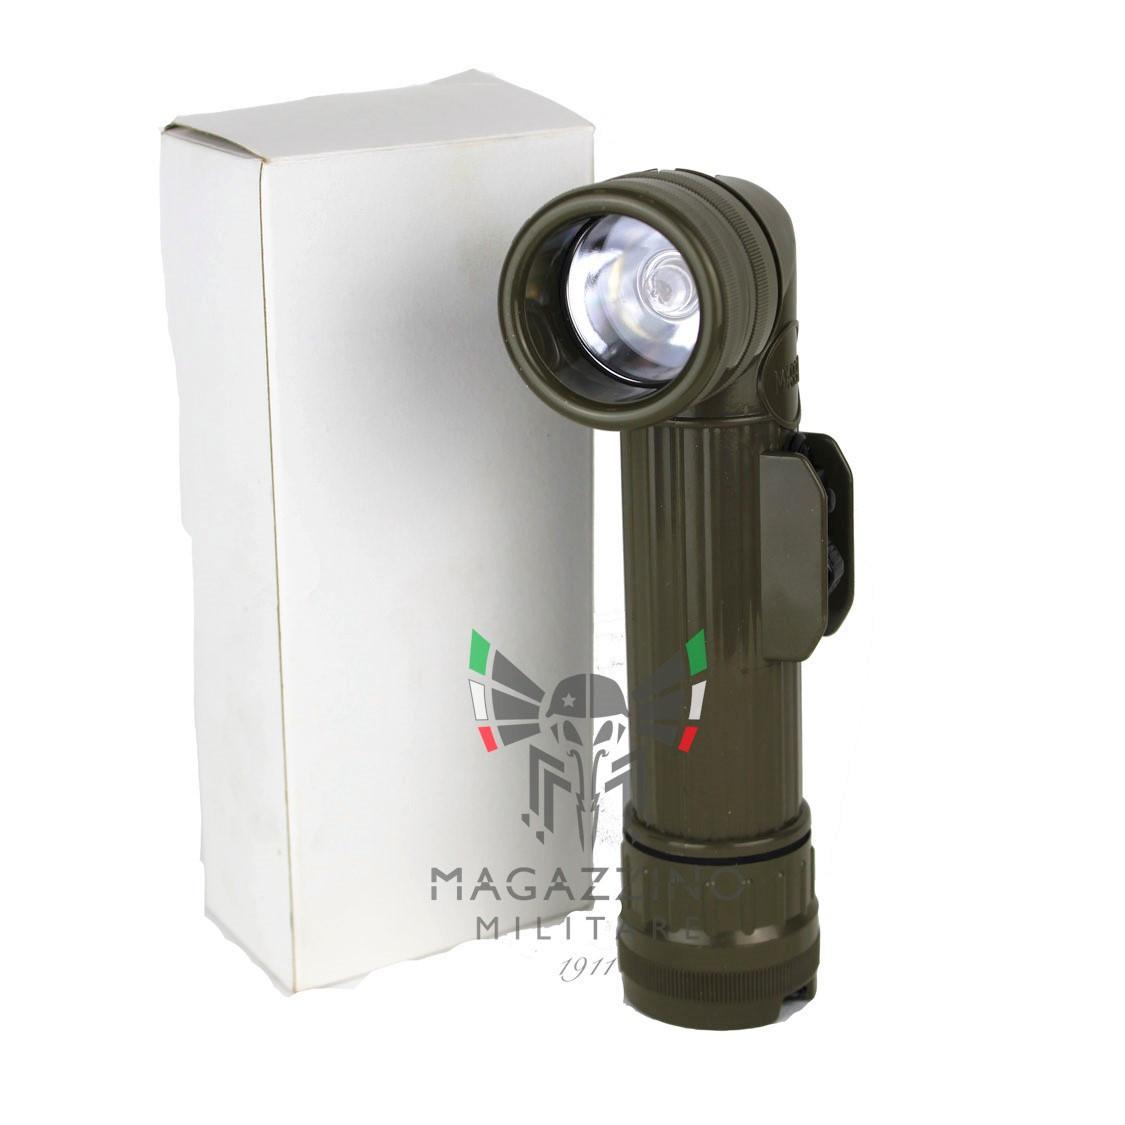 Fulton MX991 Flashlight OD Olive Originale made USA